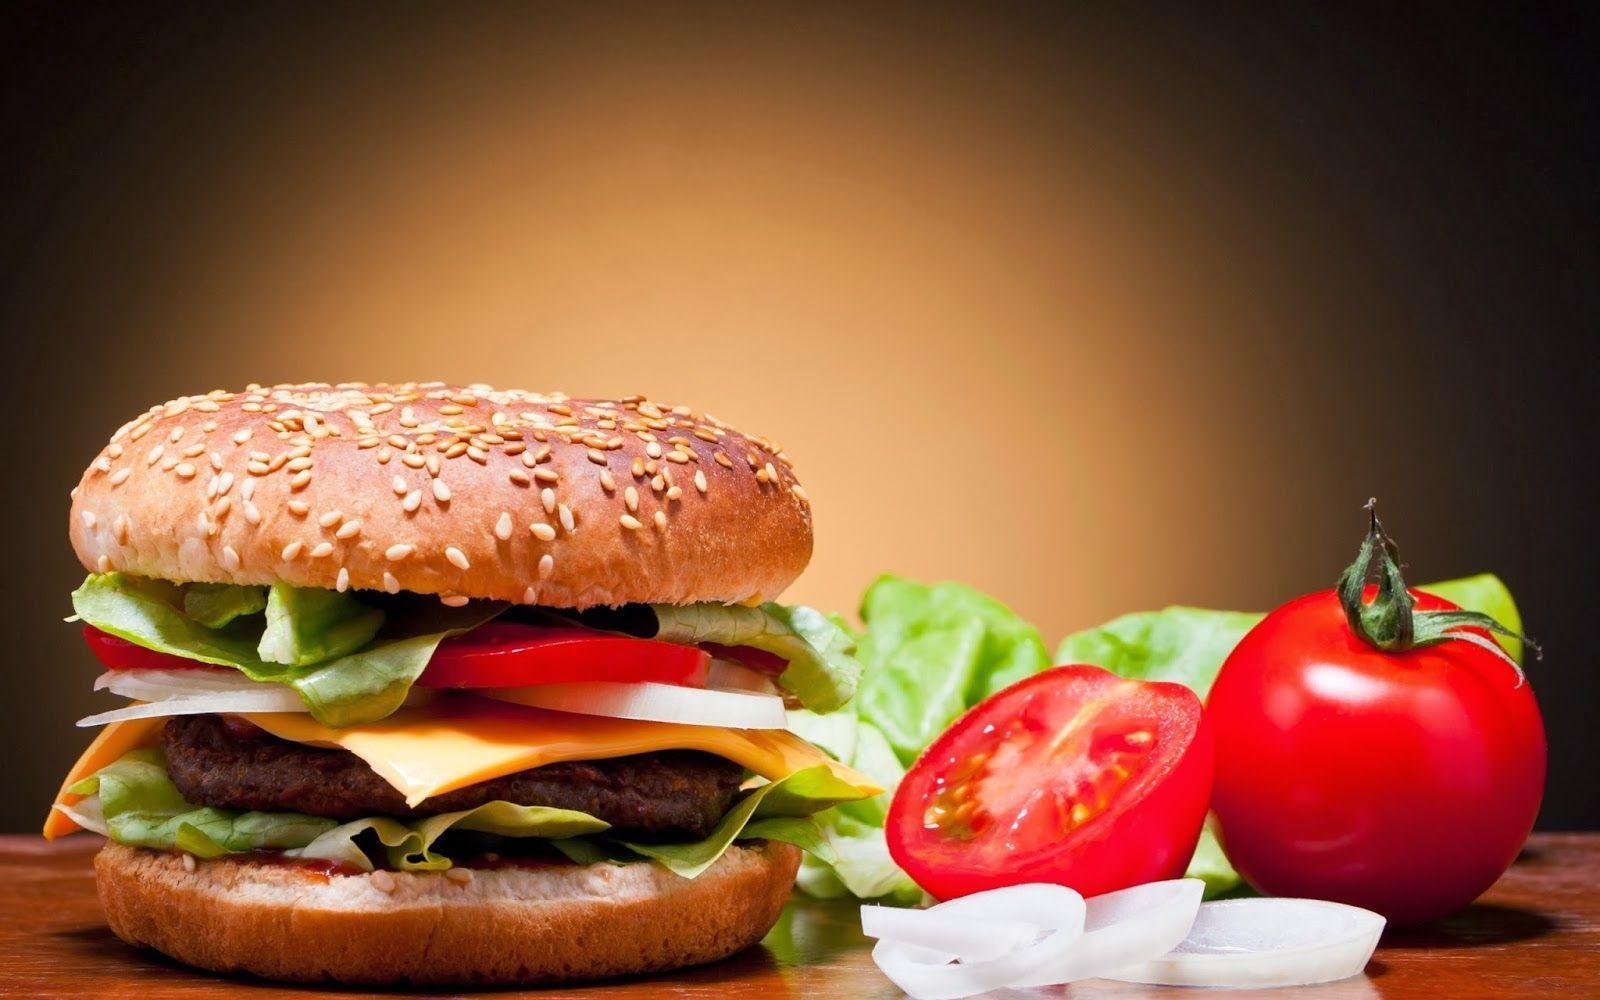 Most Inspiring Wallpaper High Quality Burger - wp1929489  Snapshot_169224.jpg